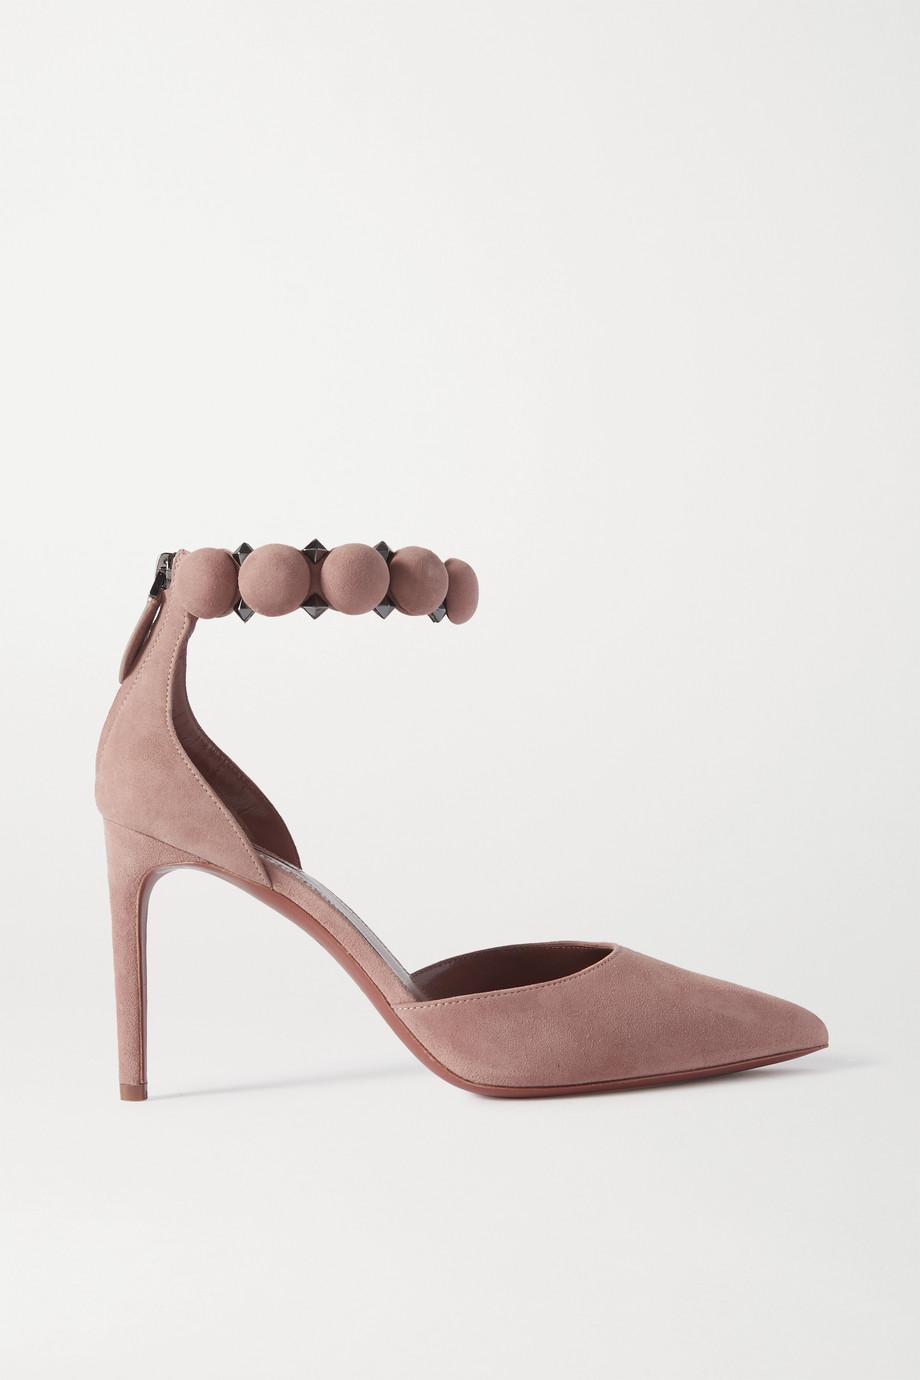 Alaïa Bombe 90 铆钉绒面革高跟鞋